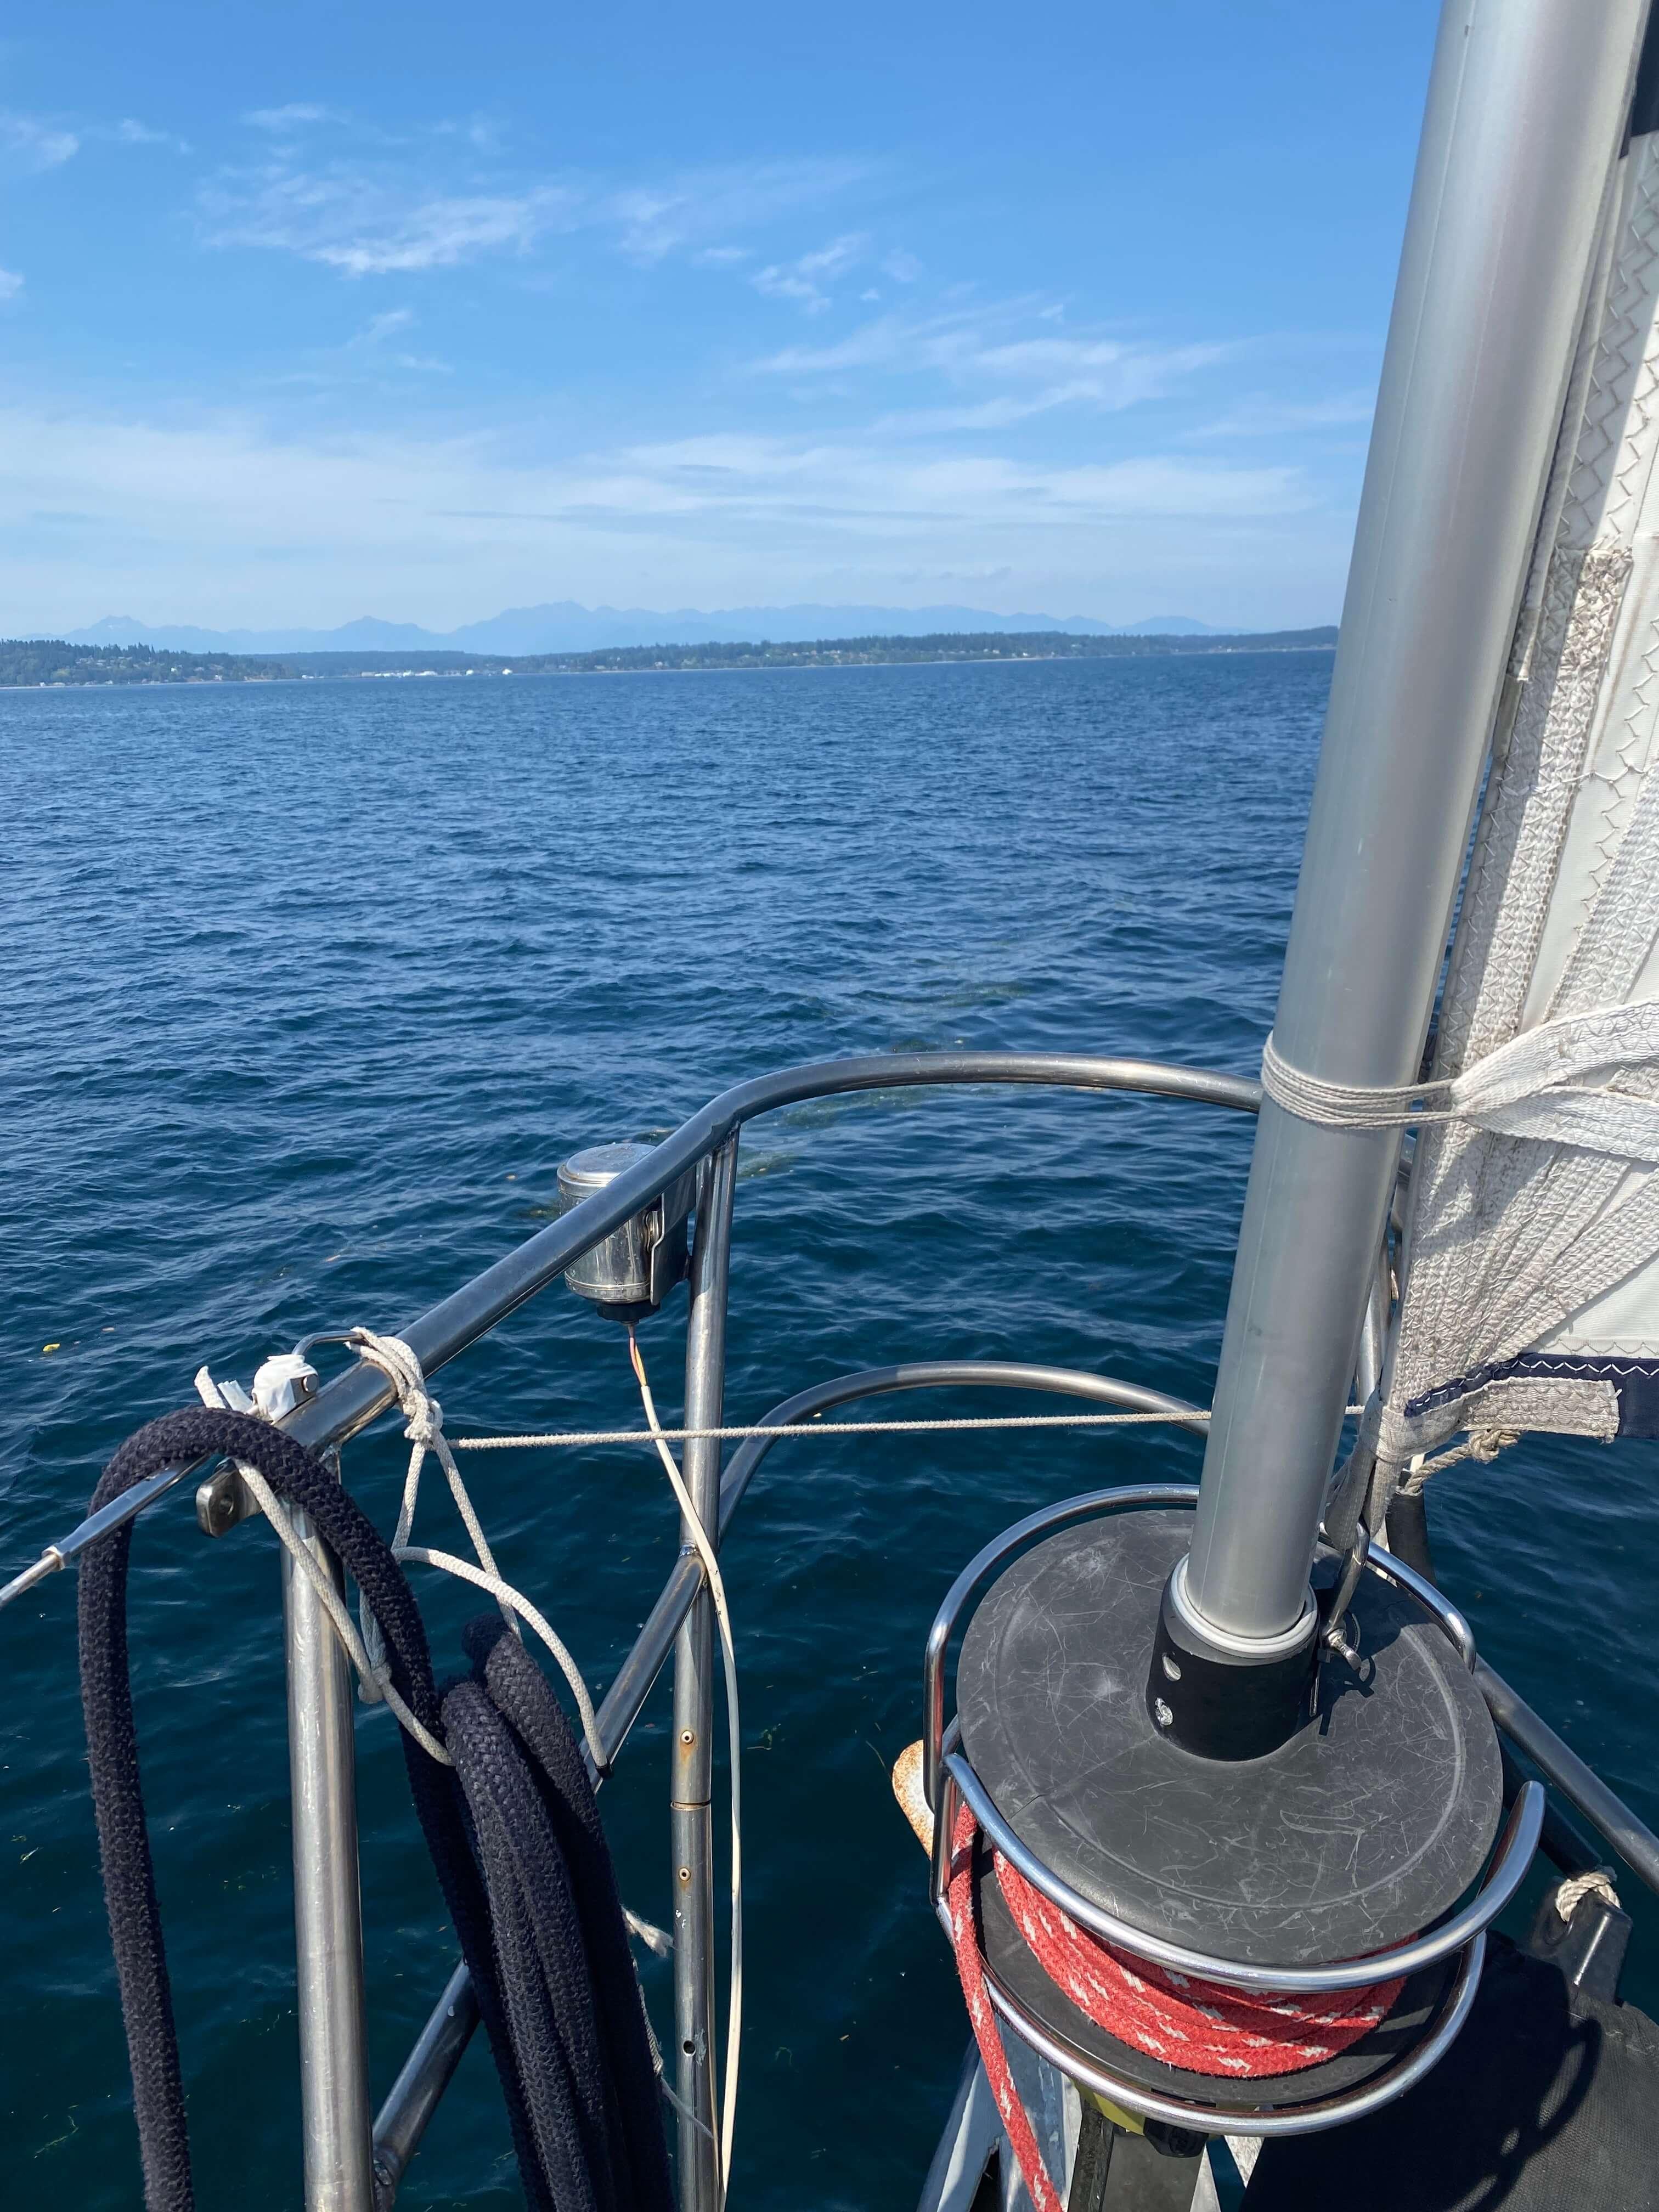 Sailing in northwest waters